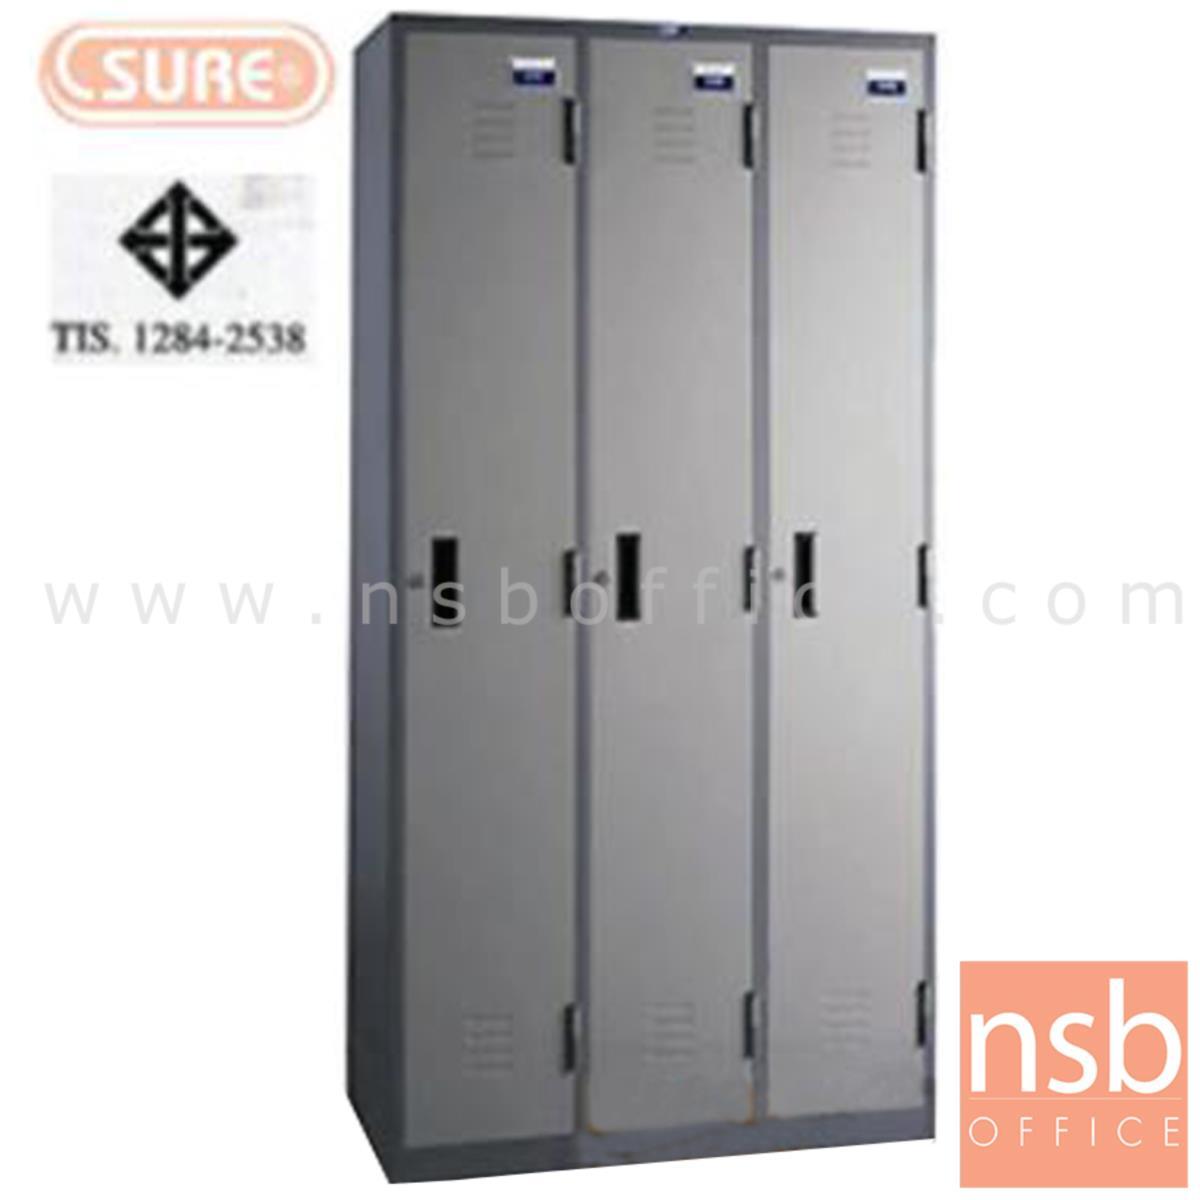 E04A019:ตู้ล็อกเกอร์ 3 ประตู มี มอก. รุ่น LK-003